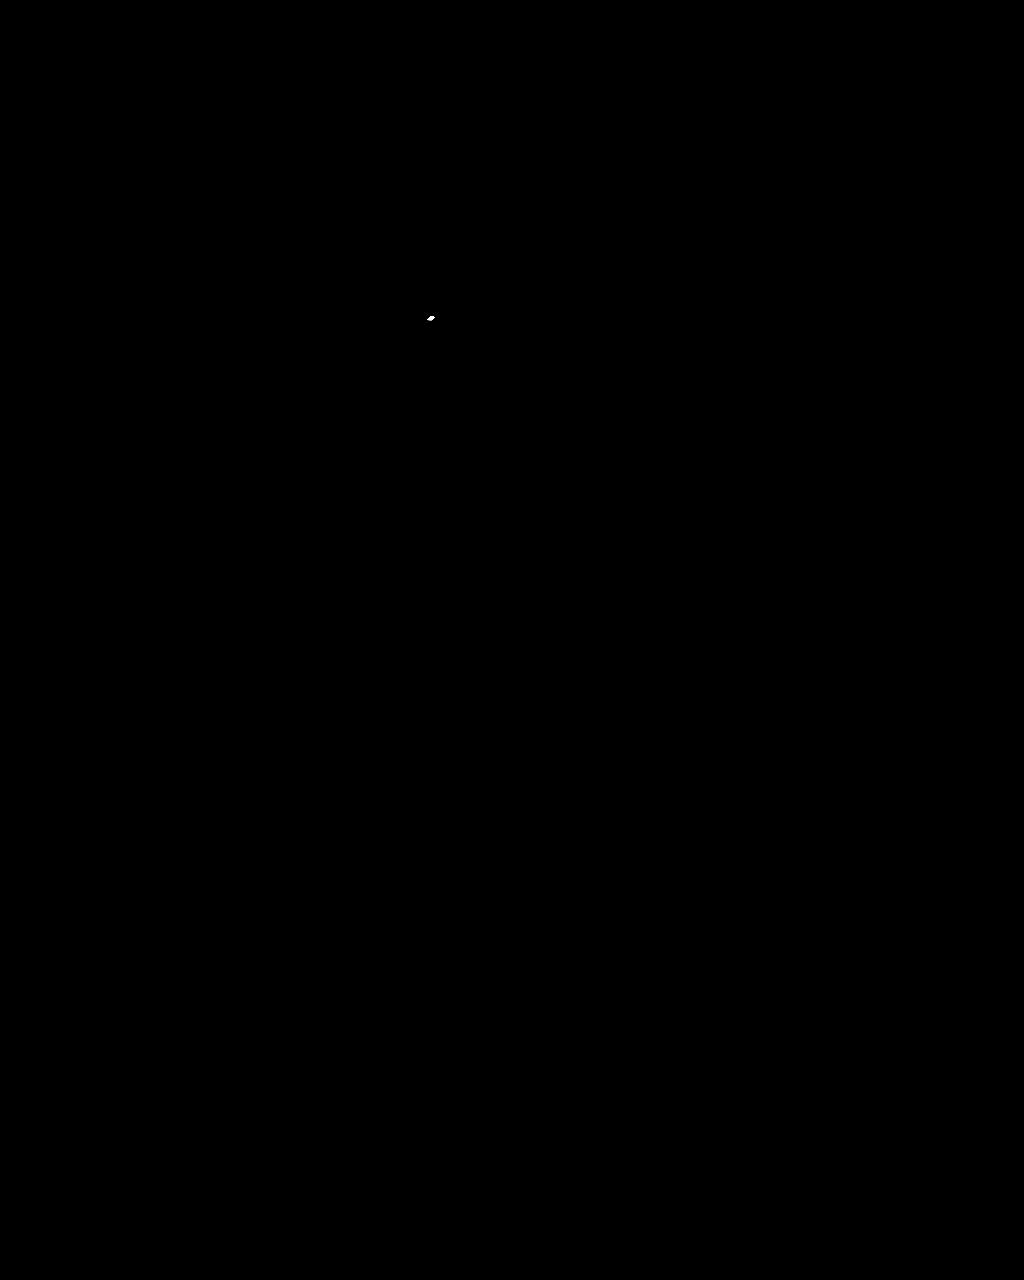 kaguya naruto shippuden